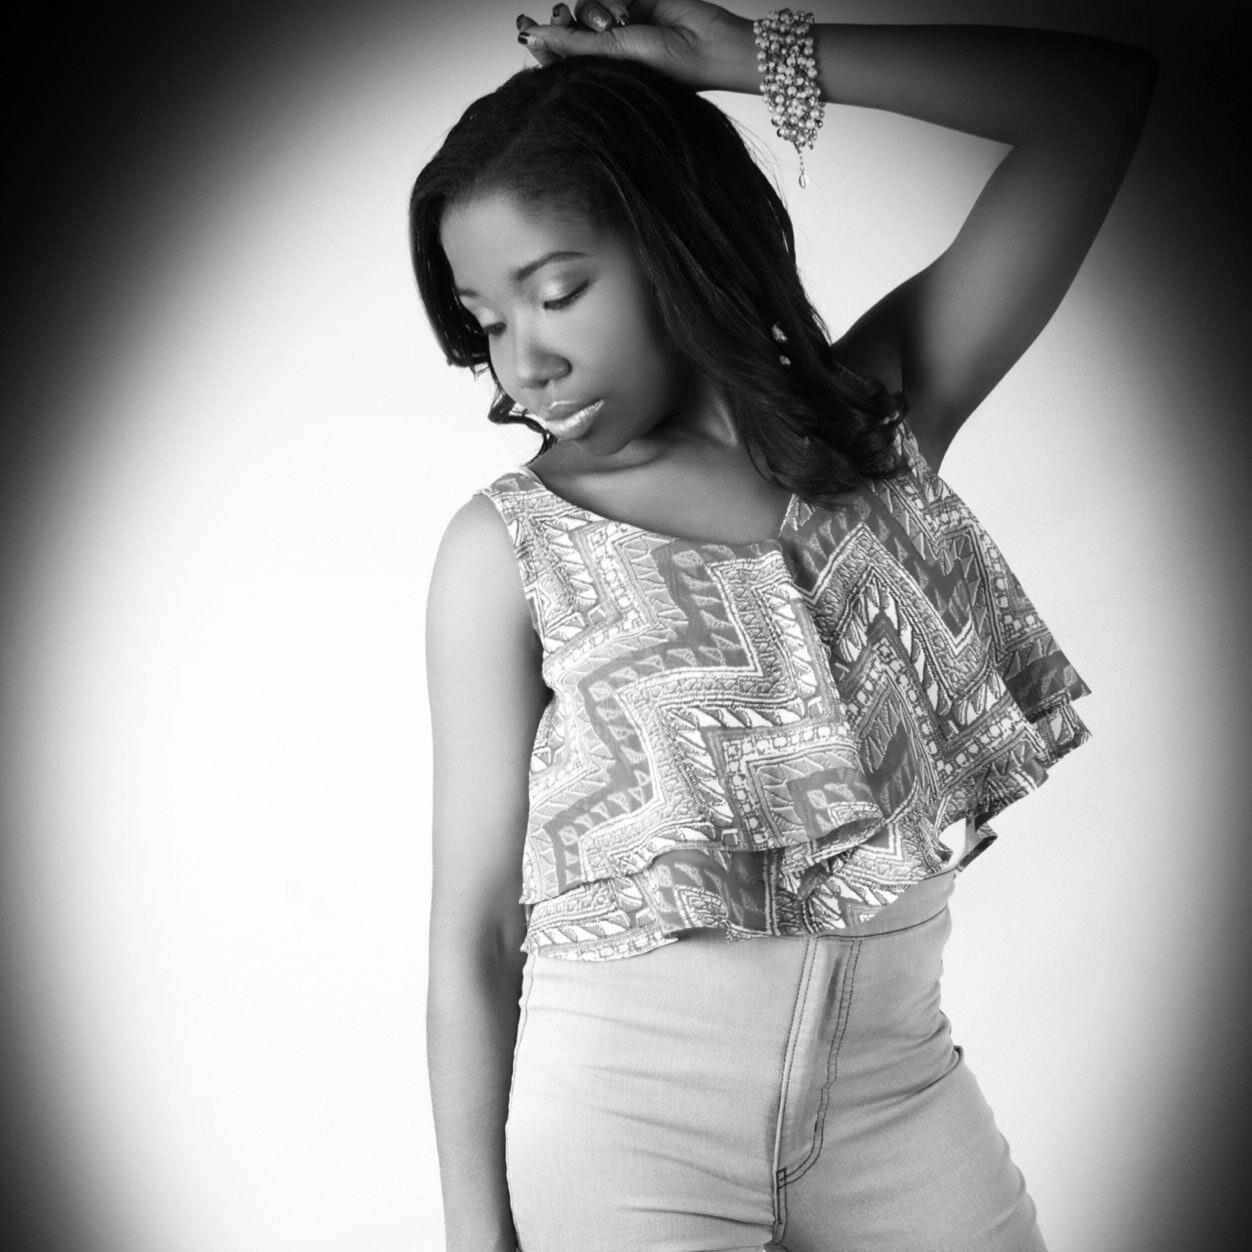 Caleya Black